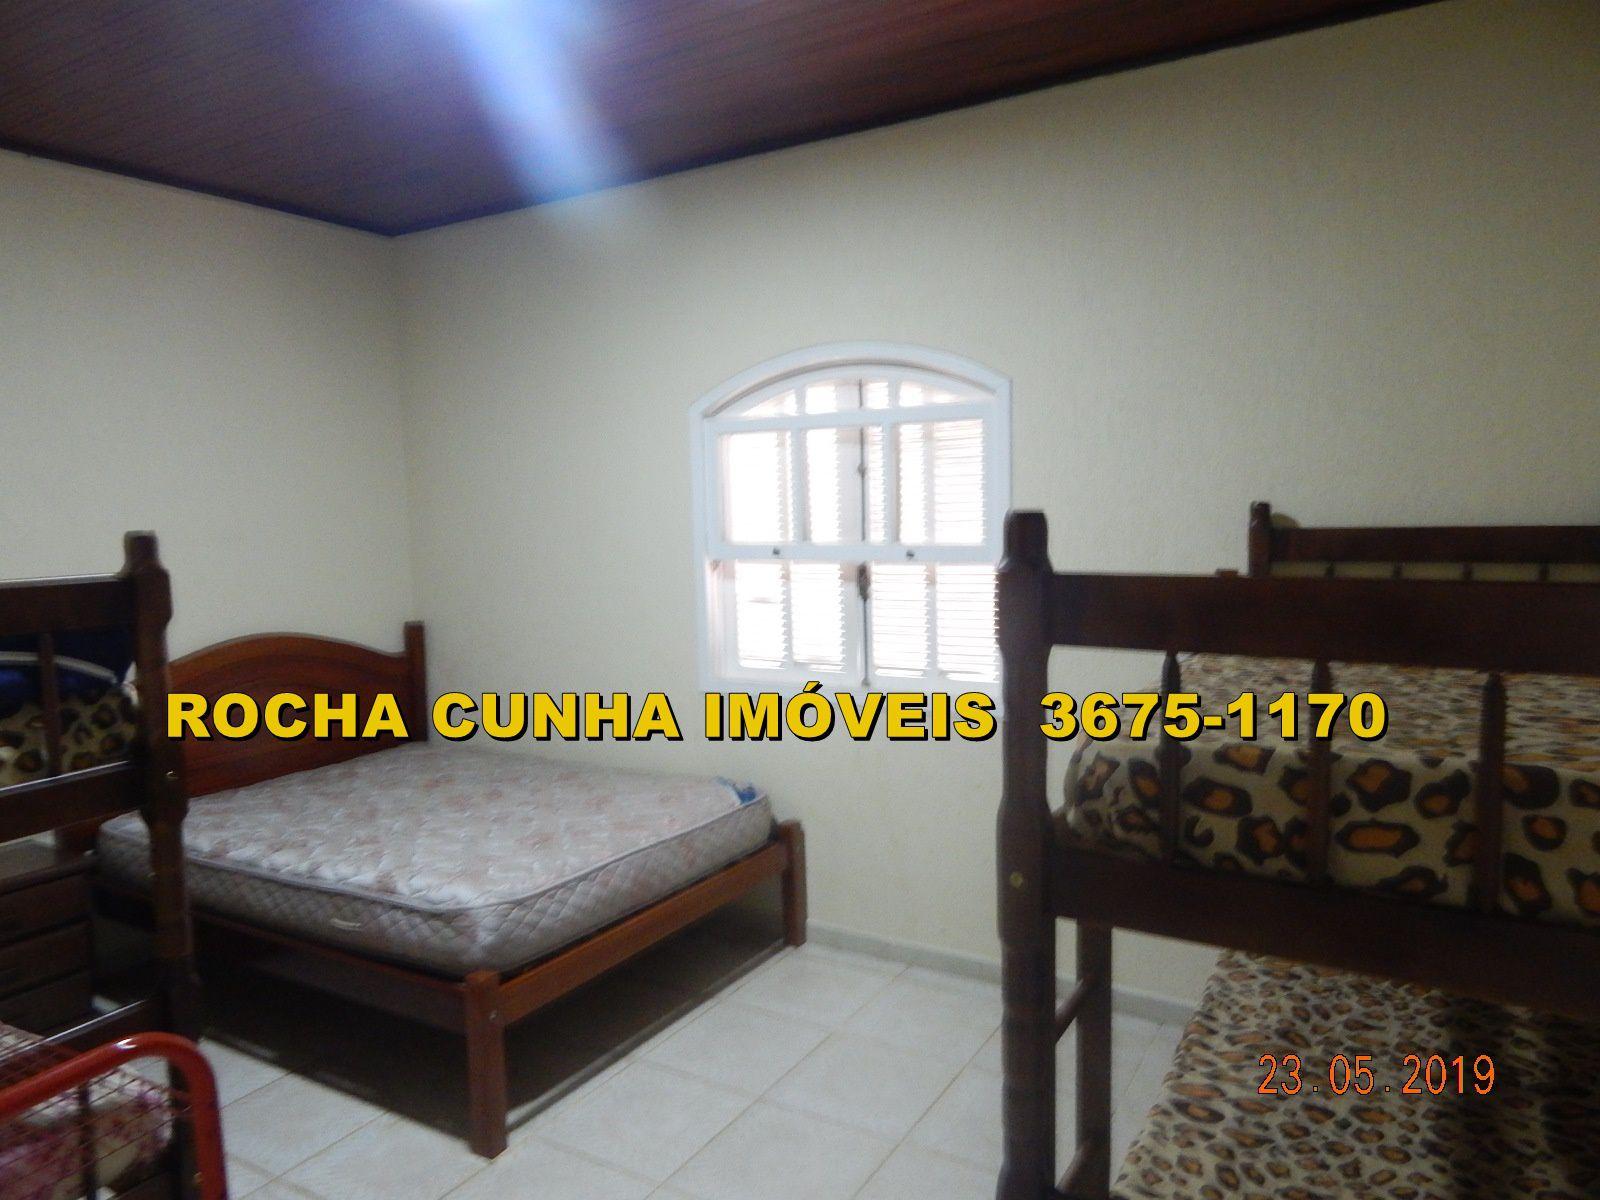 Chácara à venda Santana de Parnaíba,SP - R$ 780.000 - CHACARA0010 - 23